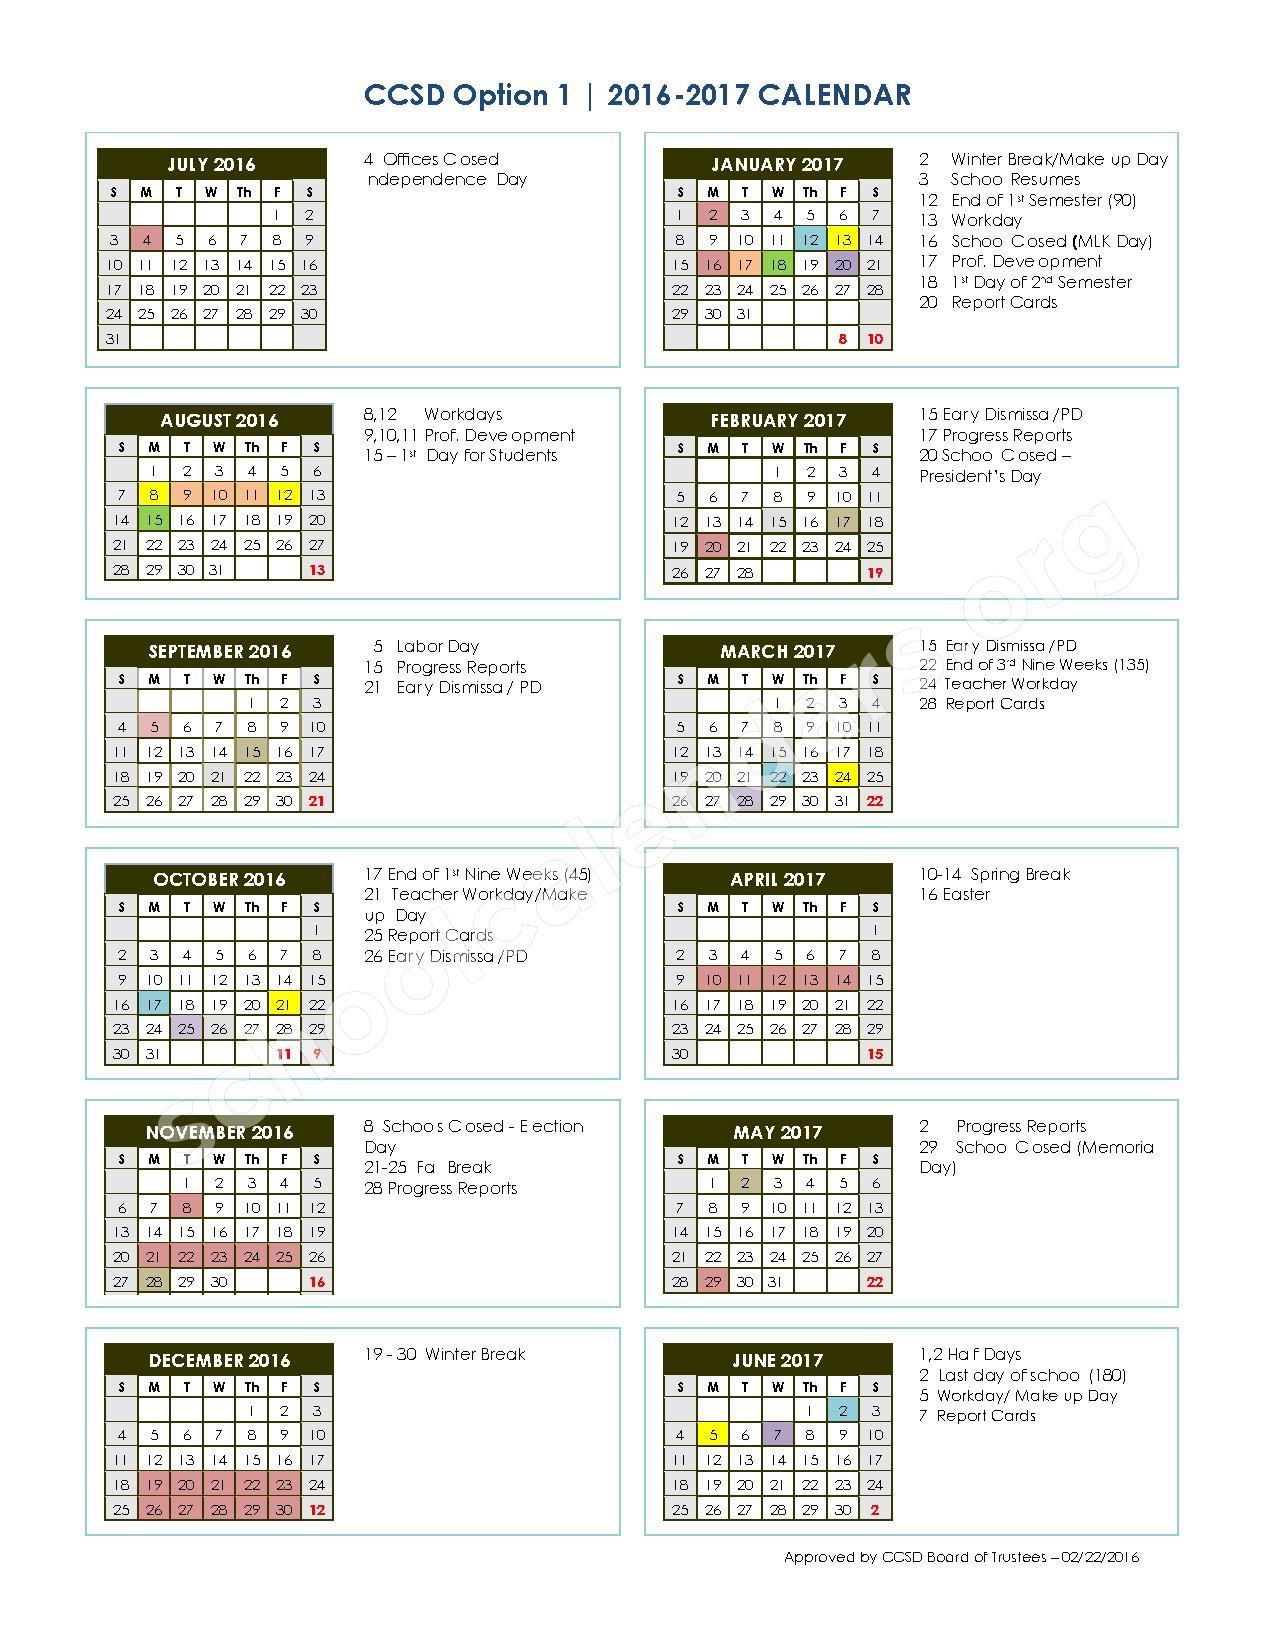 2016 - 2017 School Calendar – Charleston County School District  – page 1